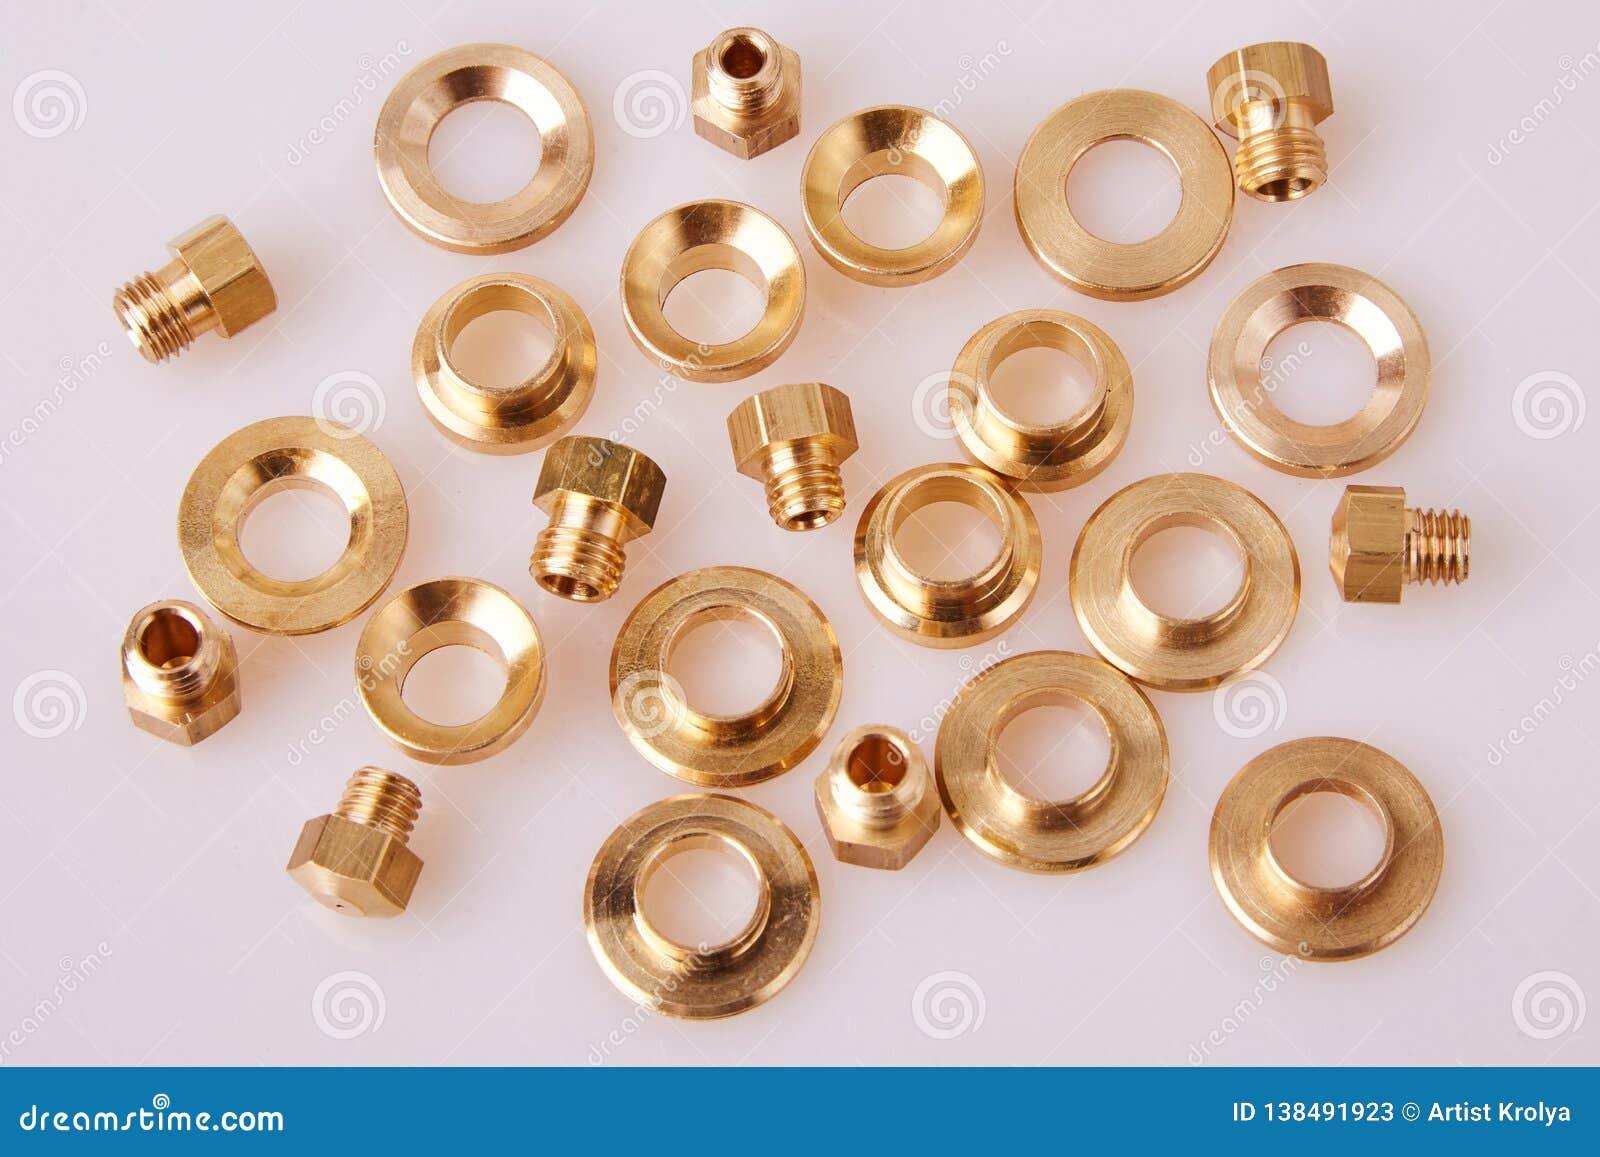 Bronze Brass Flat Washers Hardware Gaskets and GIGLEURs